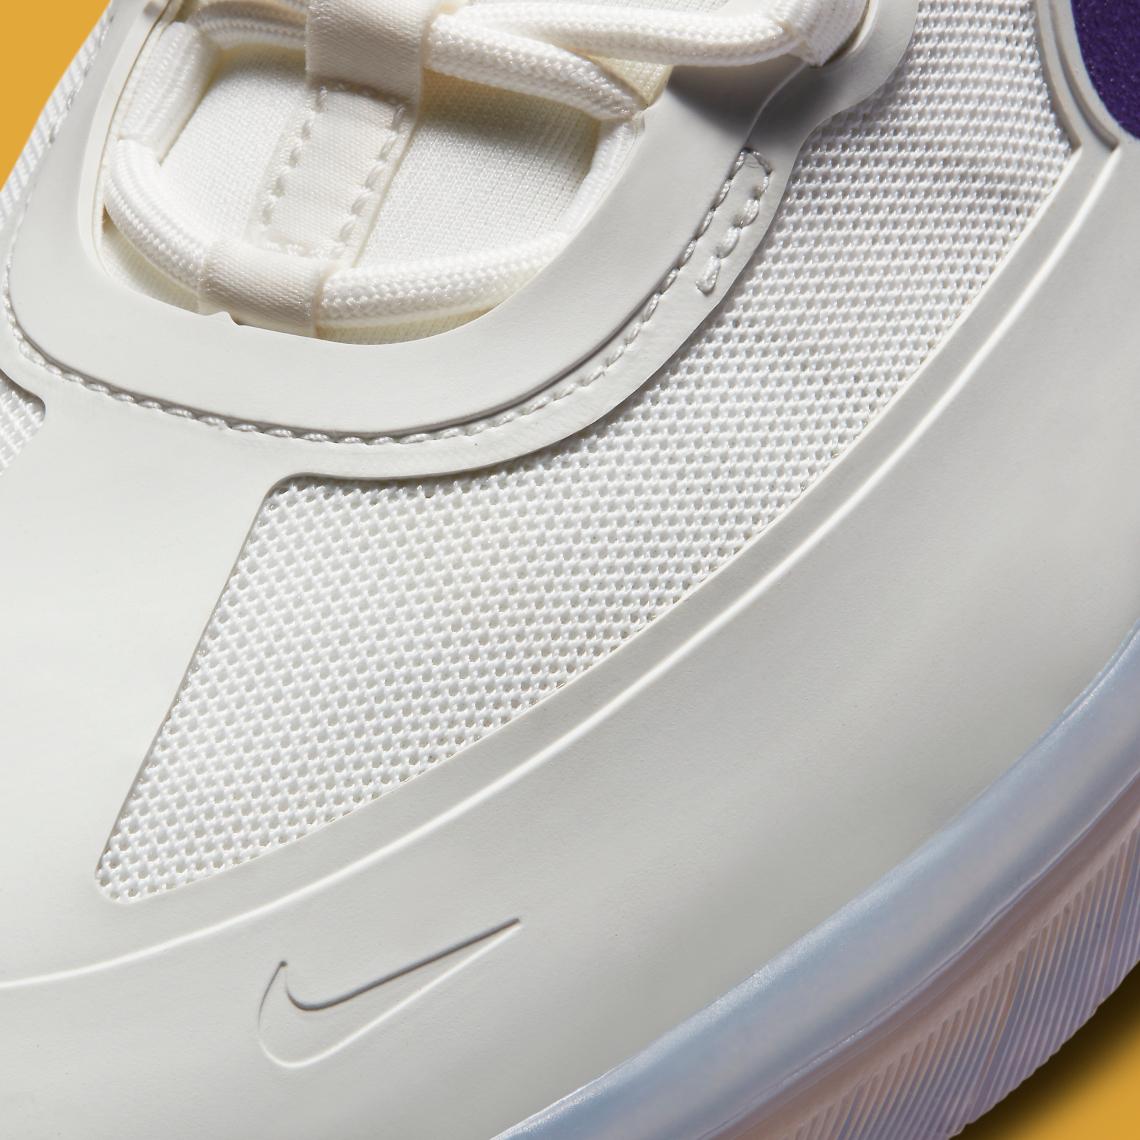 Nike SB Nyjah Free 2 Lakers DA3439-100 Release | SneakerNews.com